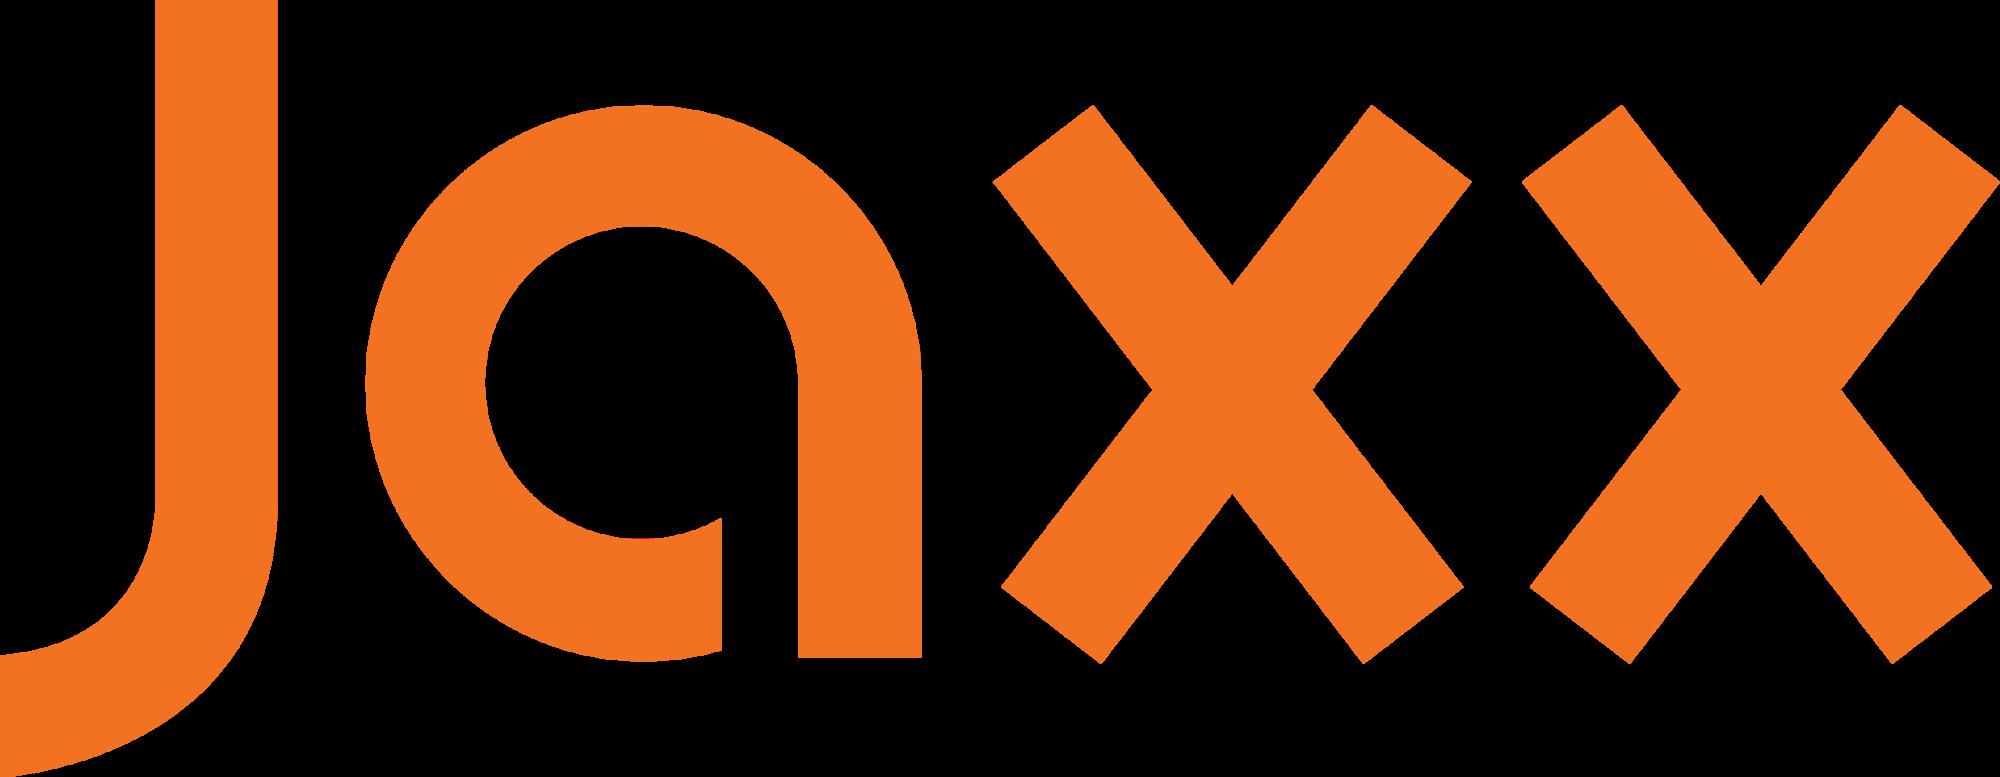 Jaxx Wallet Logo